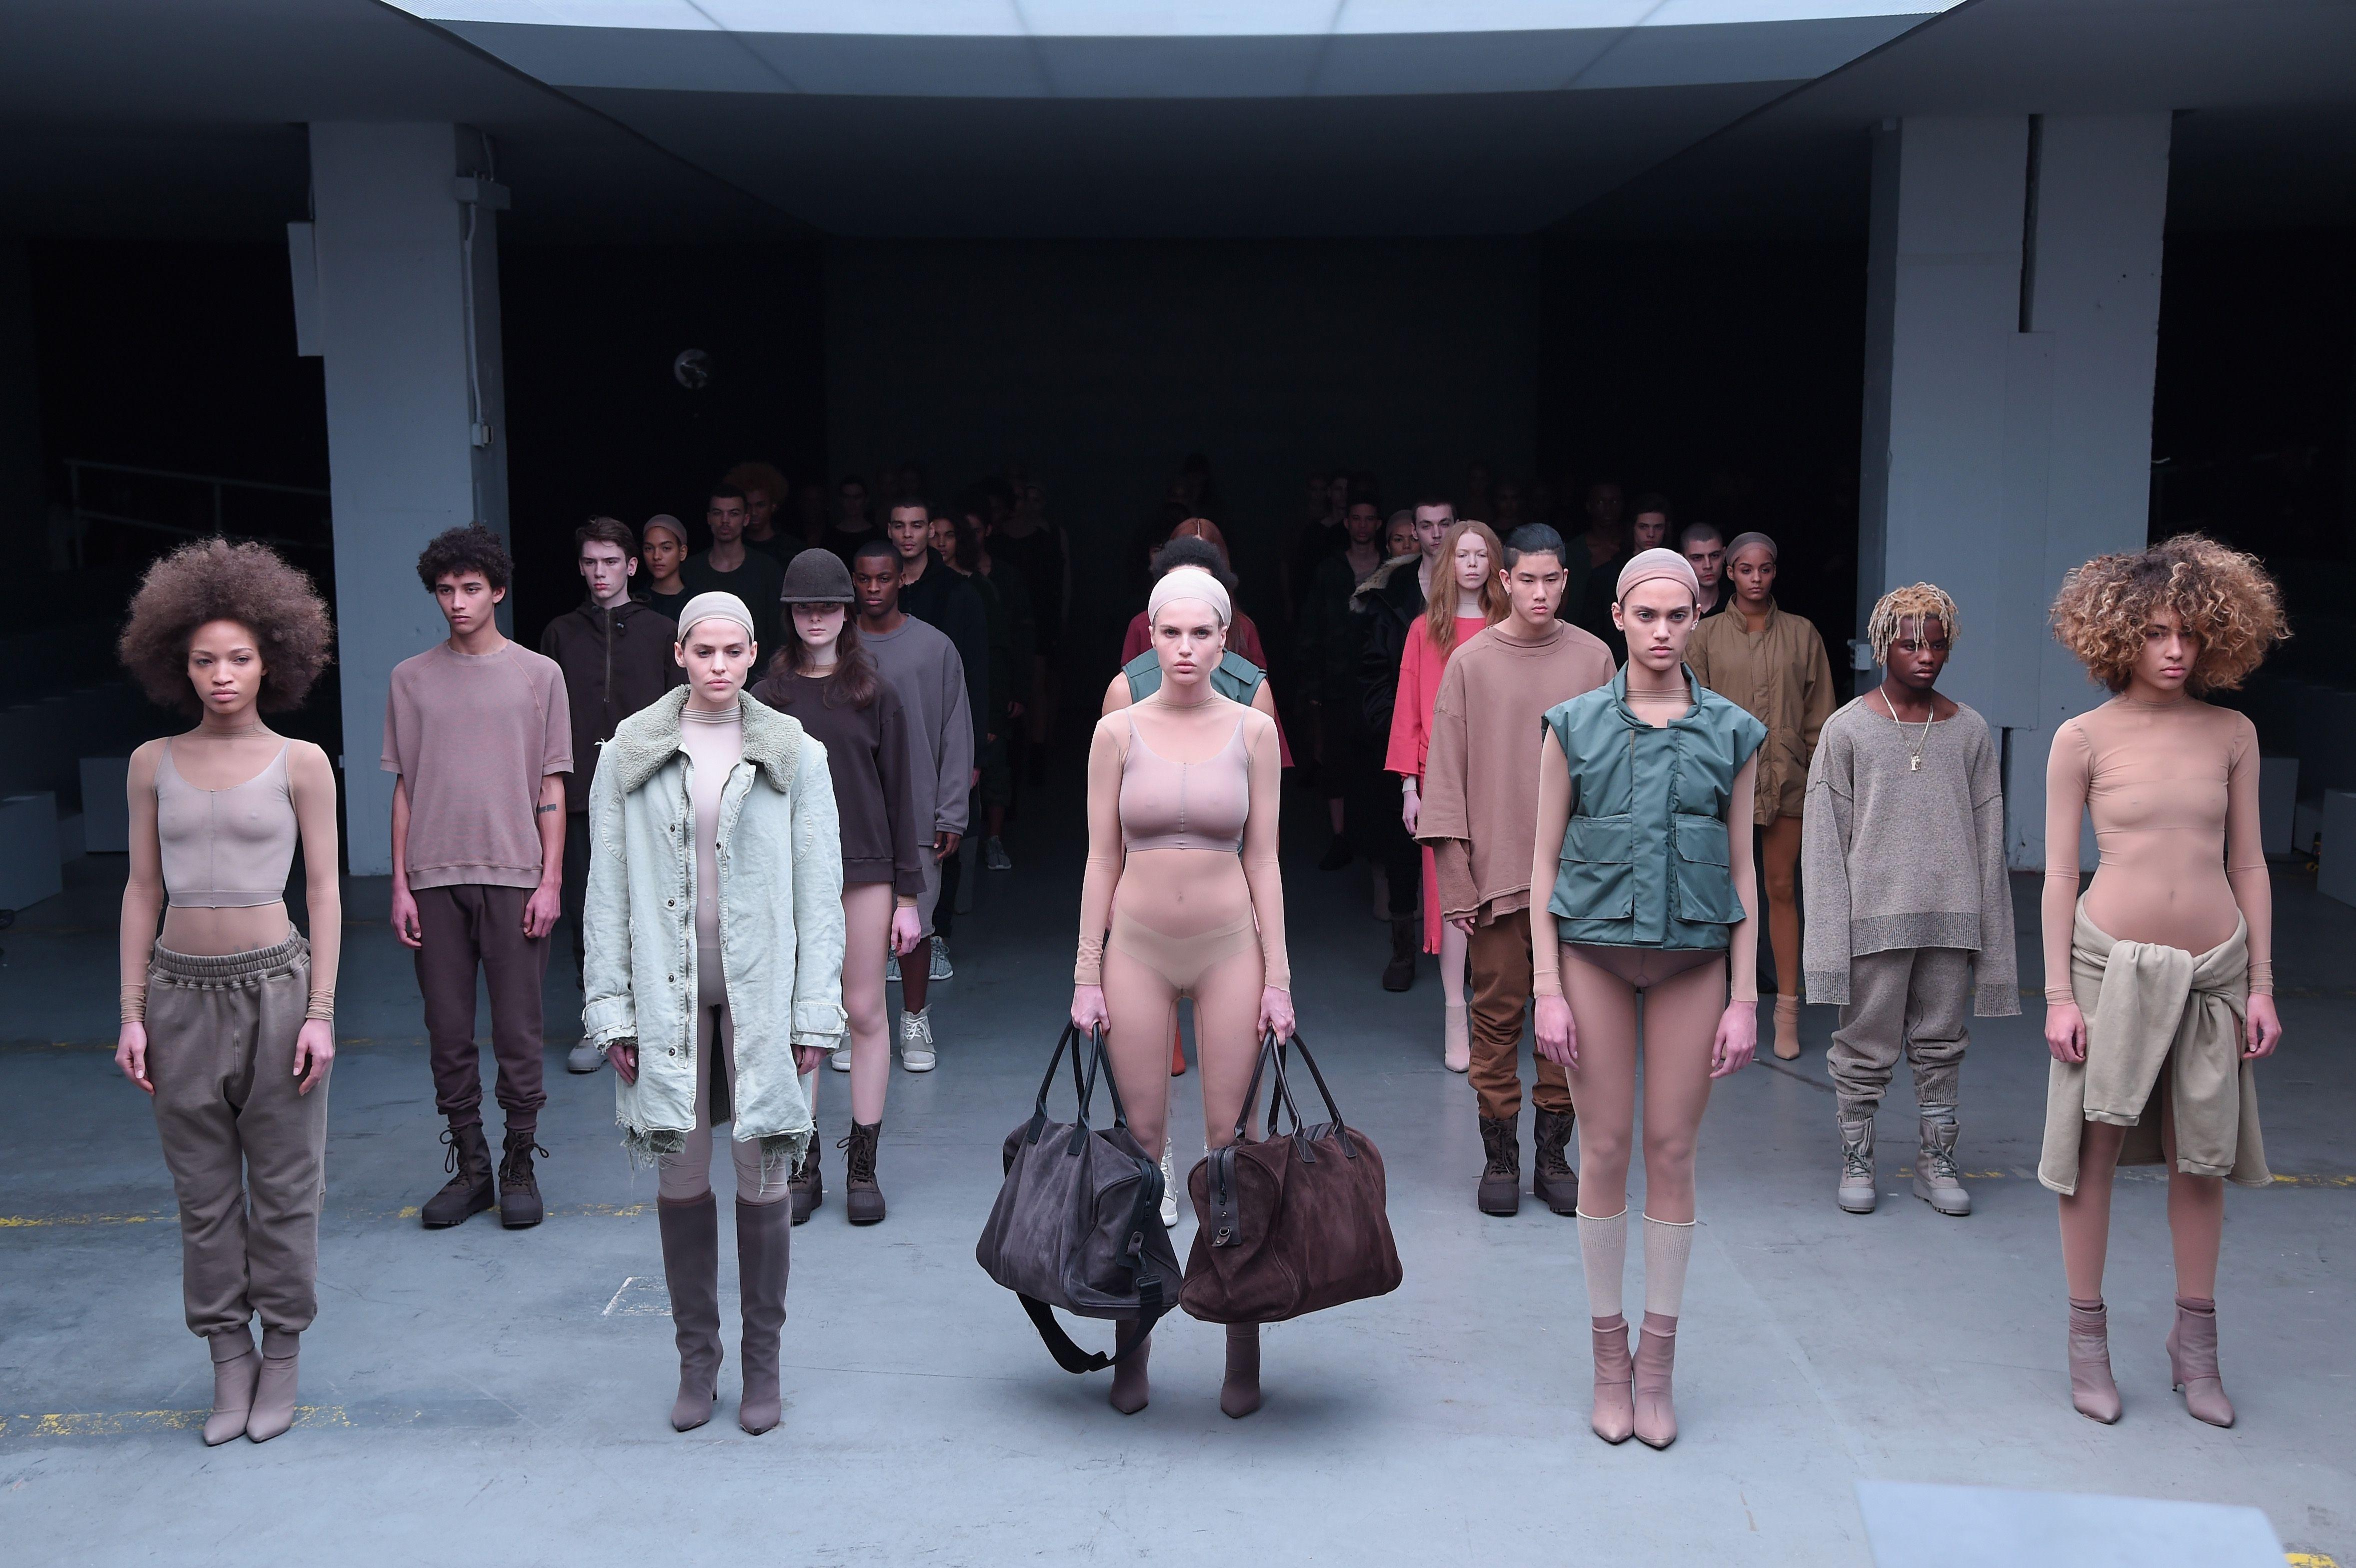 92c86e4e4e79 Everything That Happened at Kanye West s New York Fashion Week Show